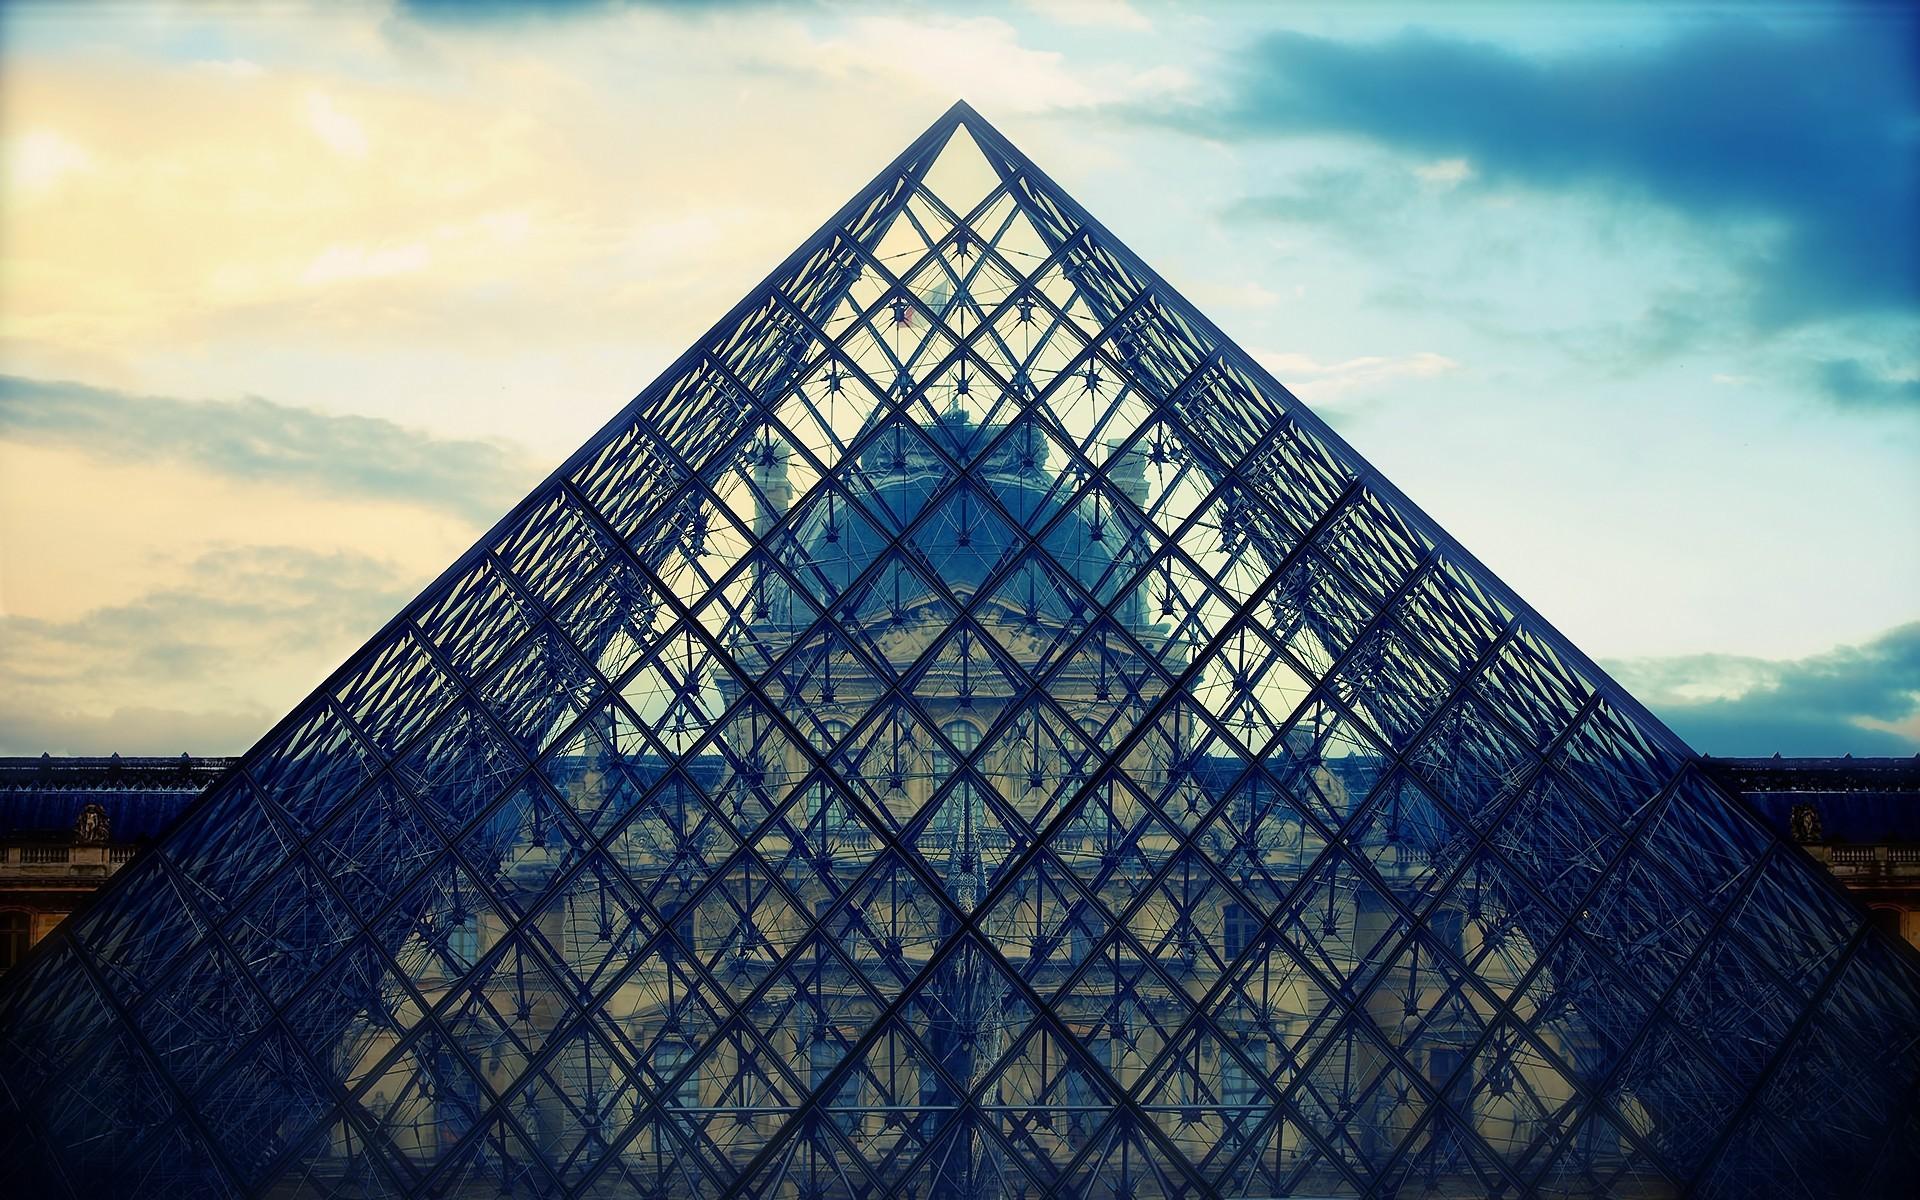 General 1920x1200 Louvre museum pyramid Paris architecture